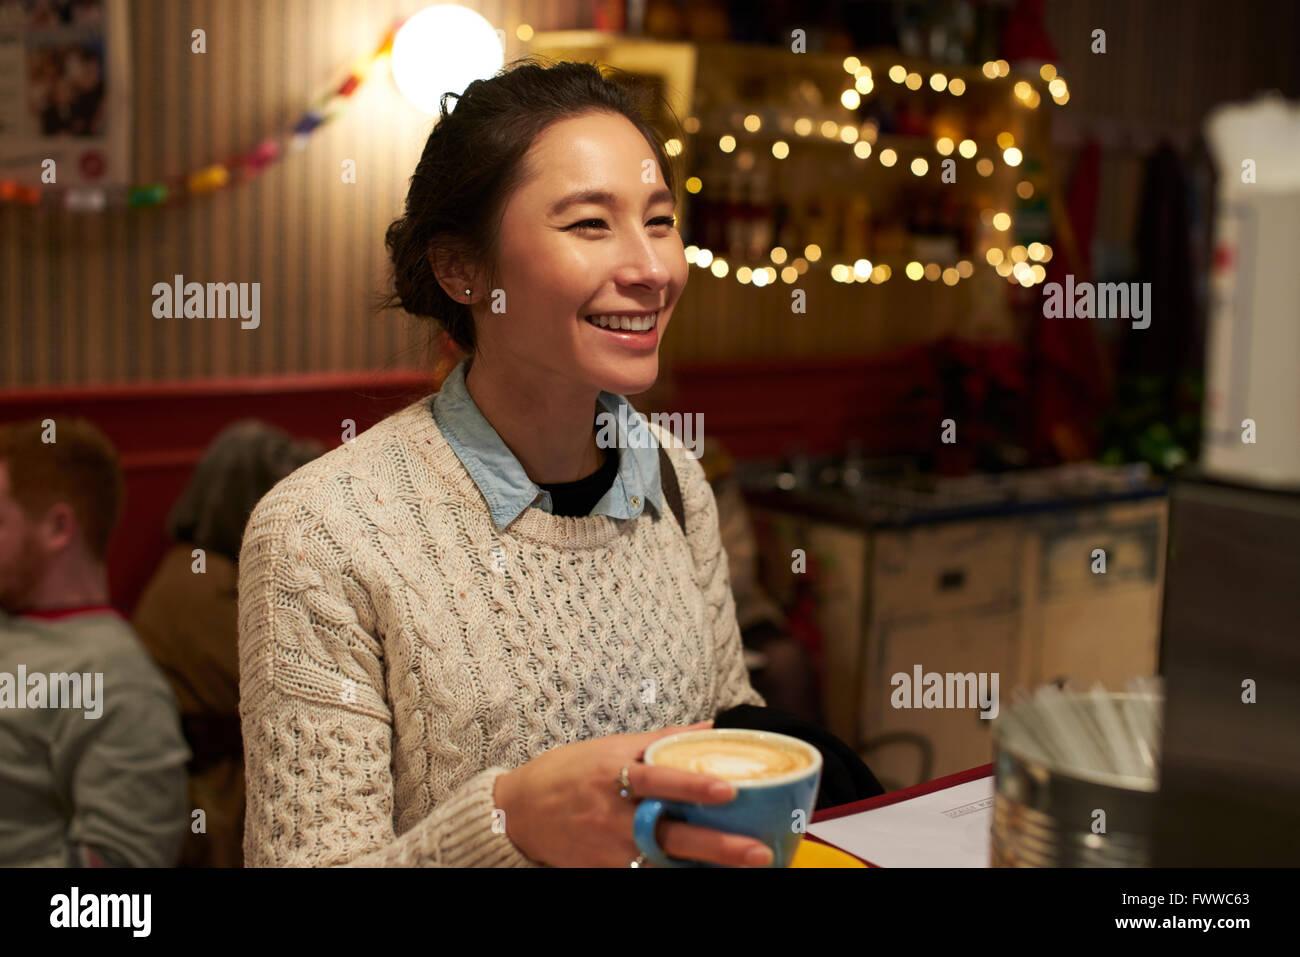 Soirée Shot of Young Woman Relaxing in Coffee Shop Photo Stock